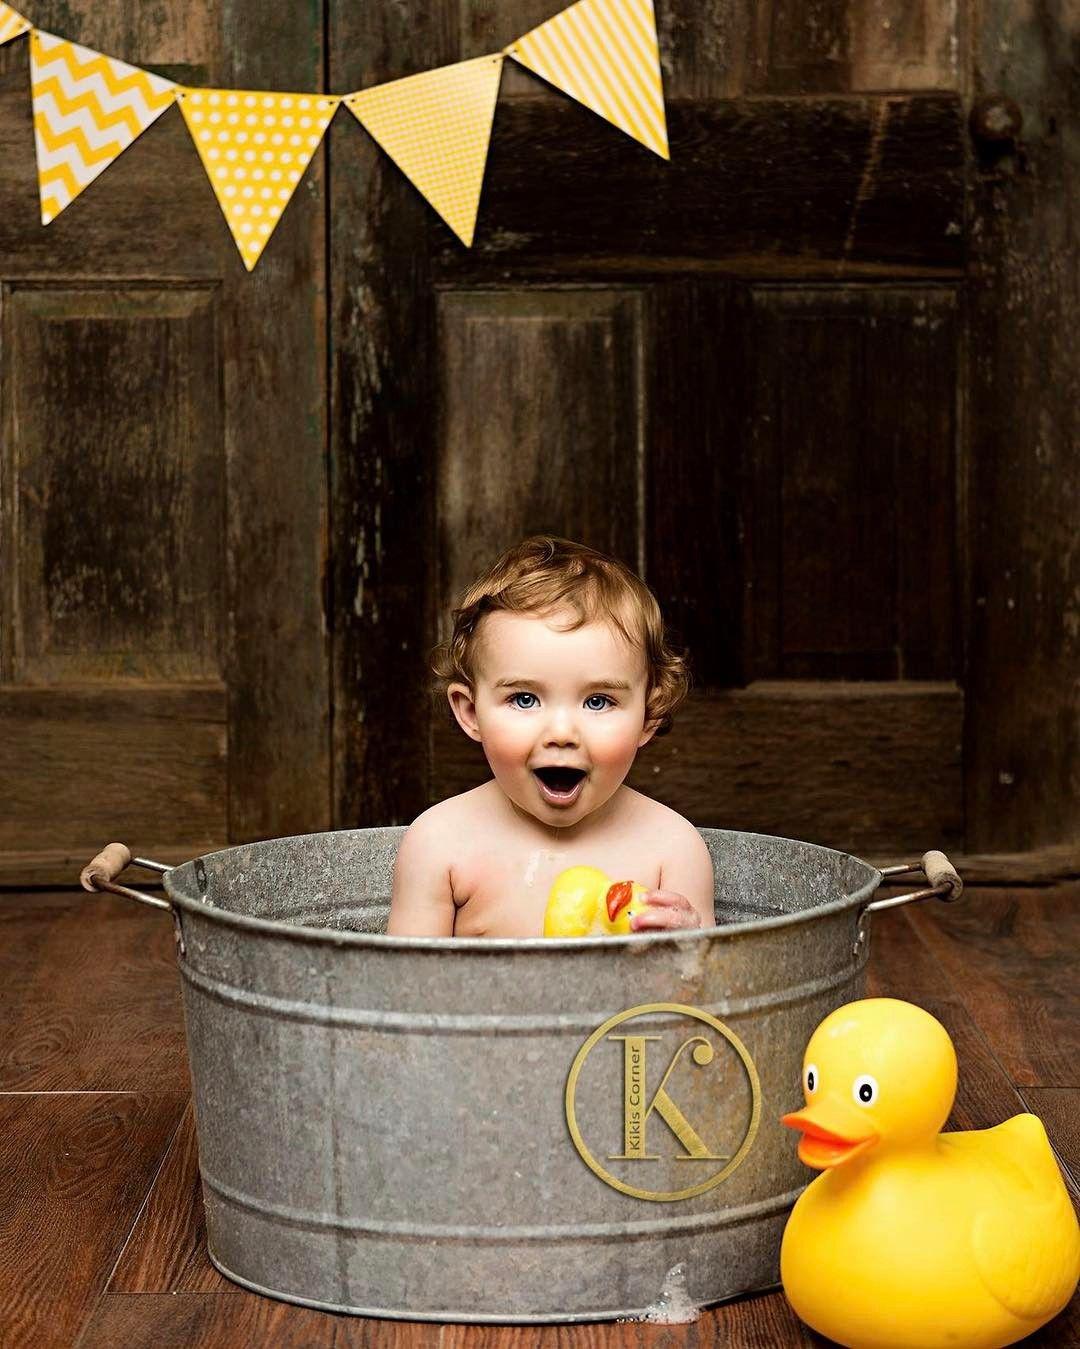 We had so much fun celebrating Mr. Jackson's 1st birthday in the Studio. Love this bathtub image and his happy expression! #firstbirthday #duck #yellowduck #bathtub #cutie #birthdayboy #posepatch